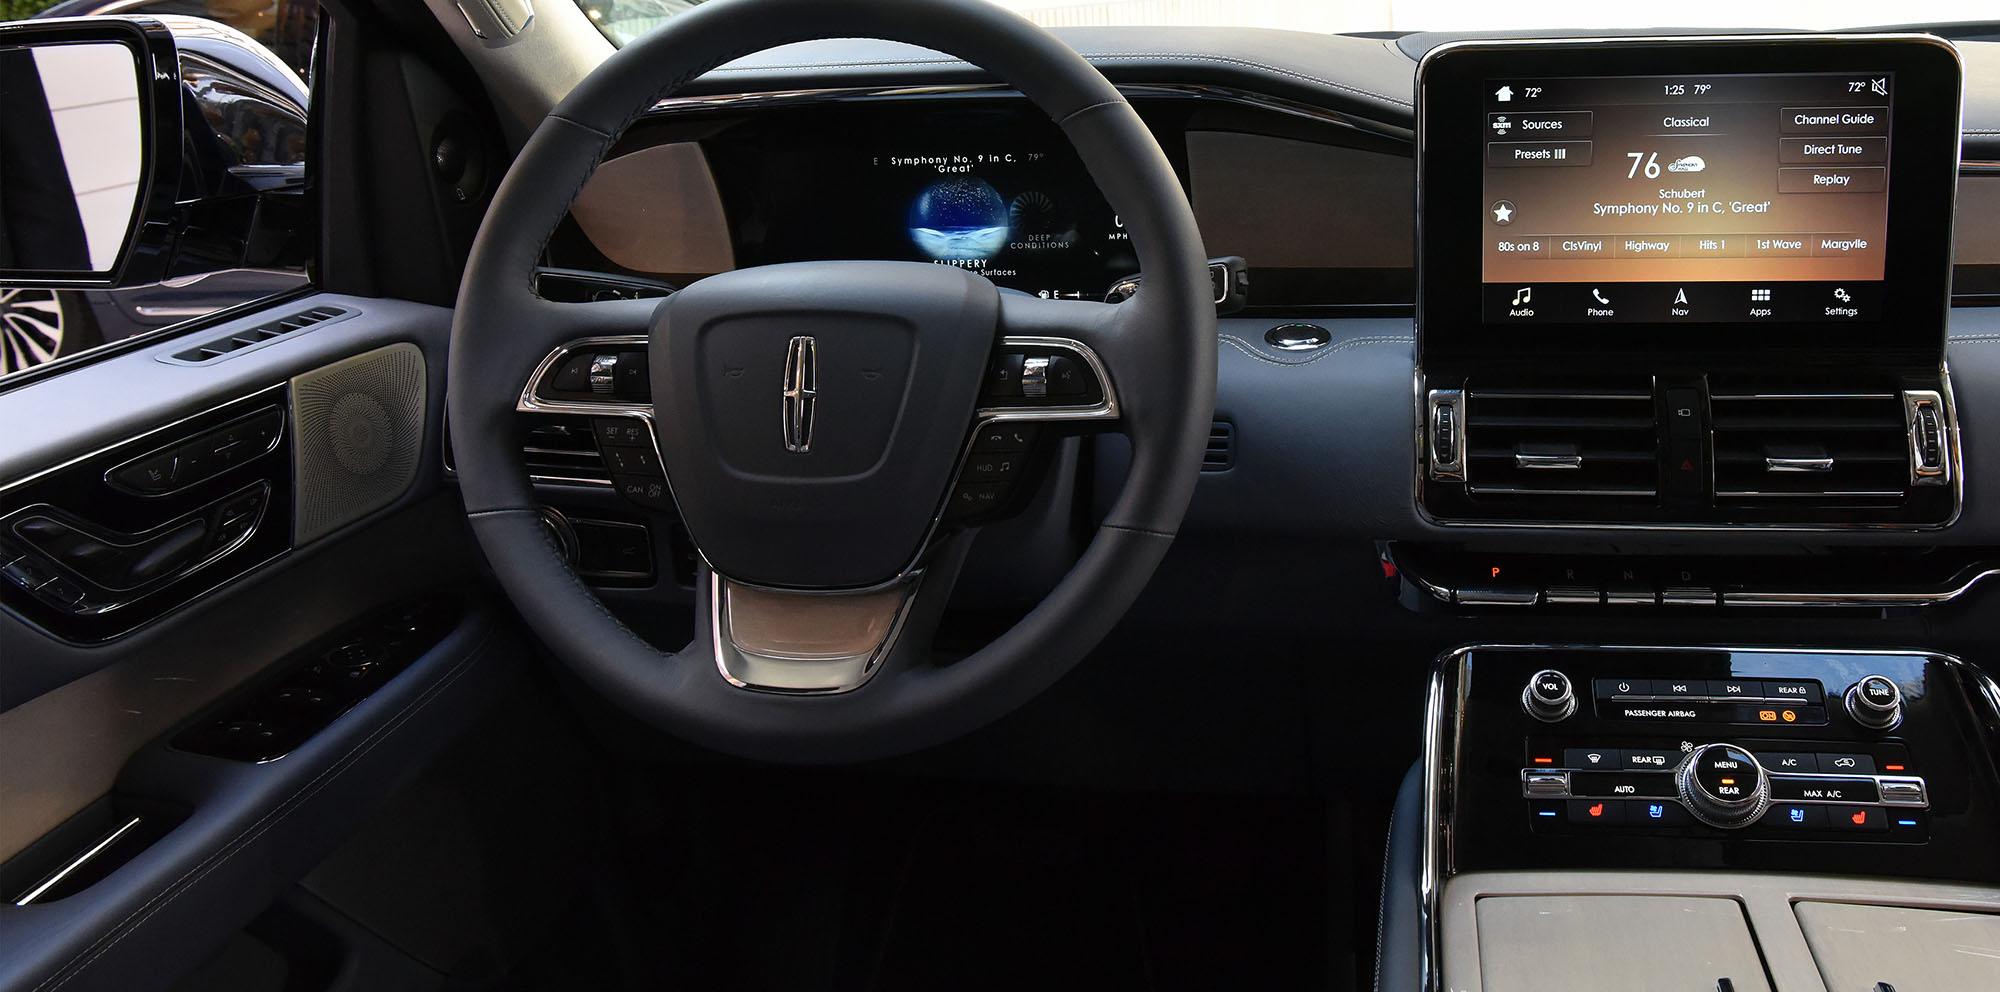 2017 Escalade Interior >> 2017 Escalade Interior Best Upcoming Car Release 2020